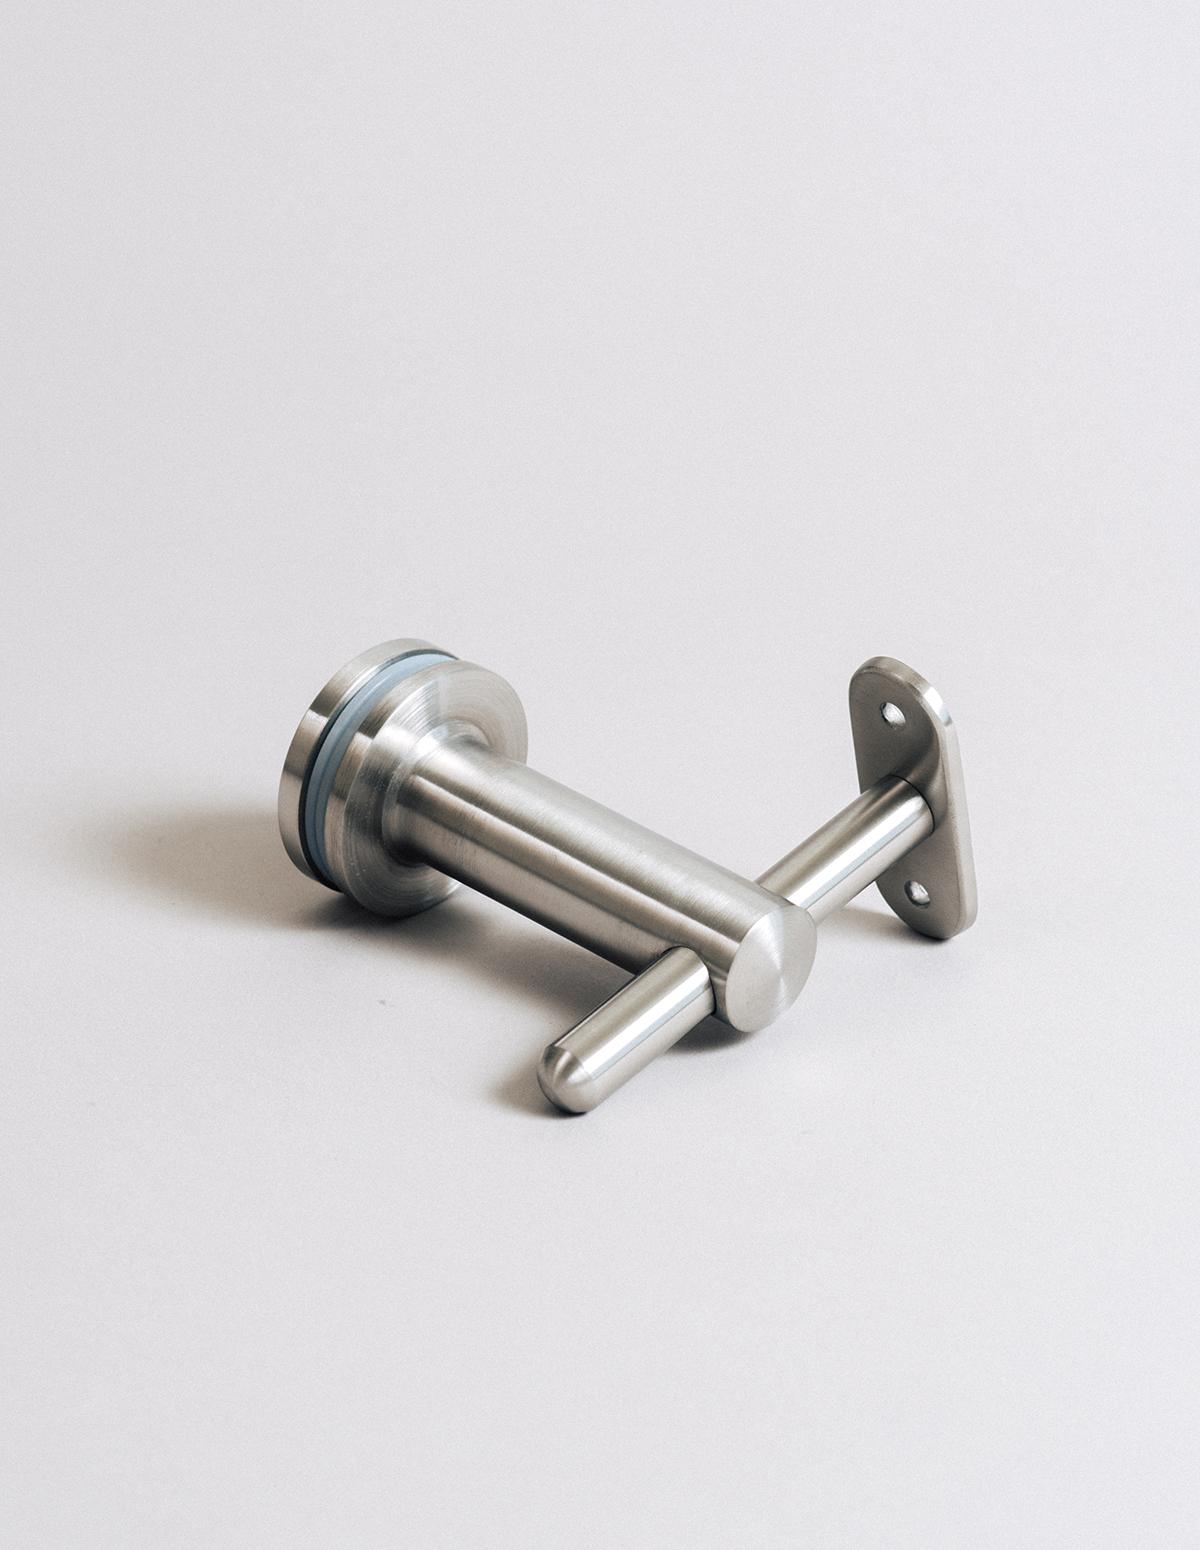 Optimum-Studios-Architectural-Glass-Metal-HardwarePage-HandrailBracket5-042216